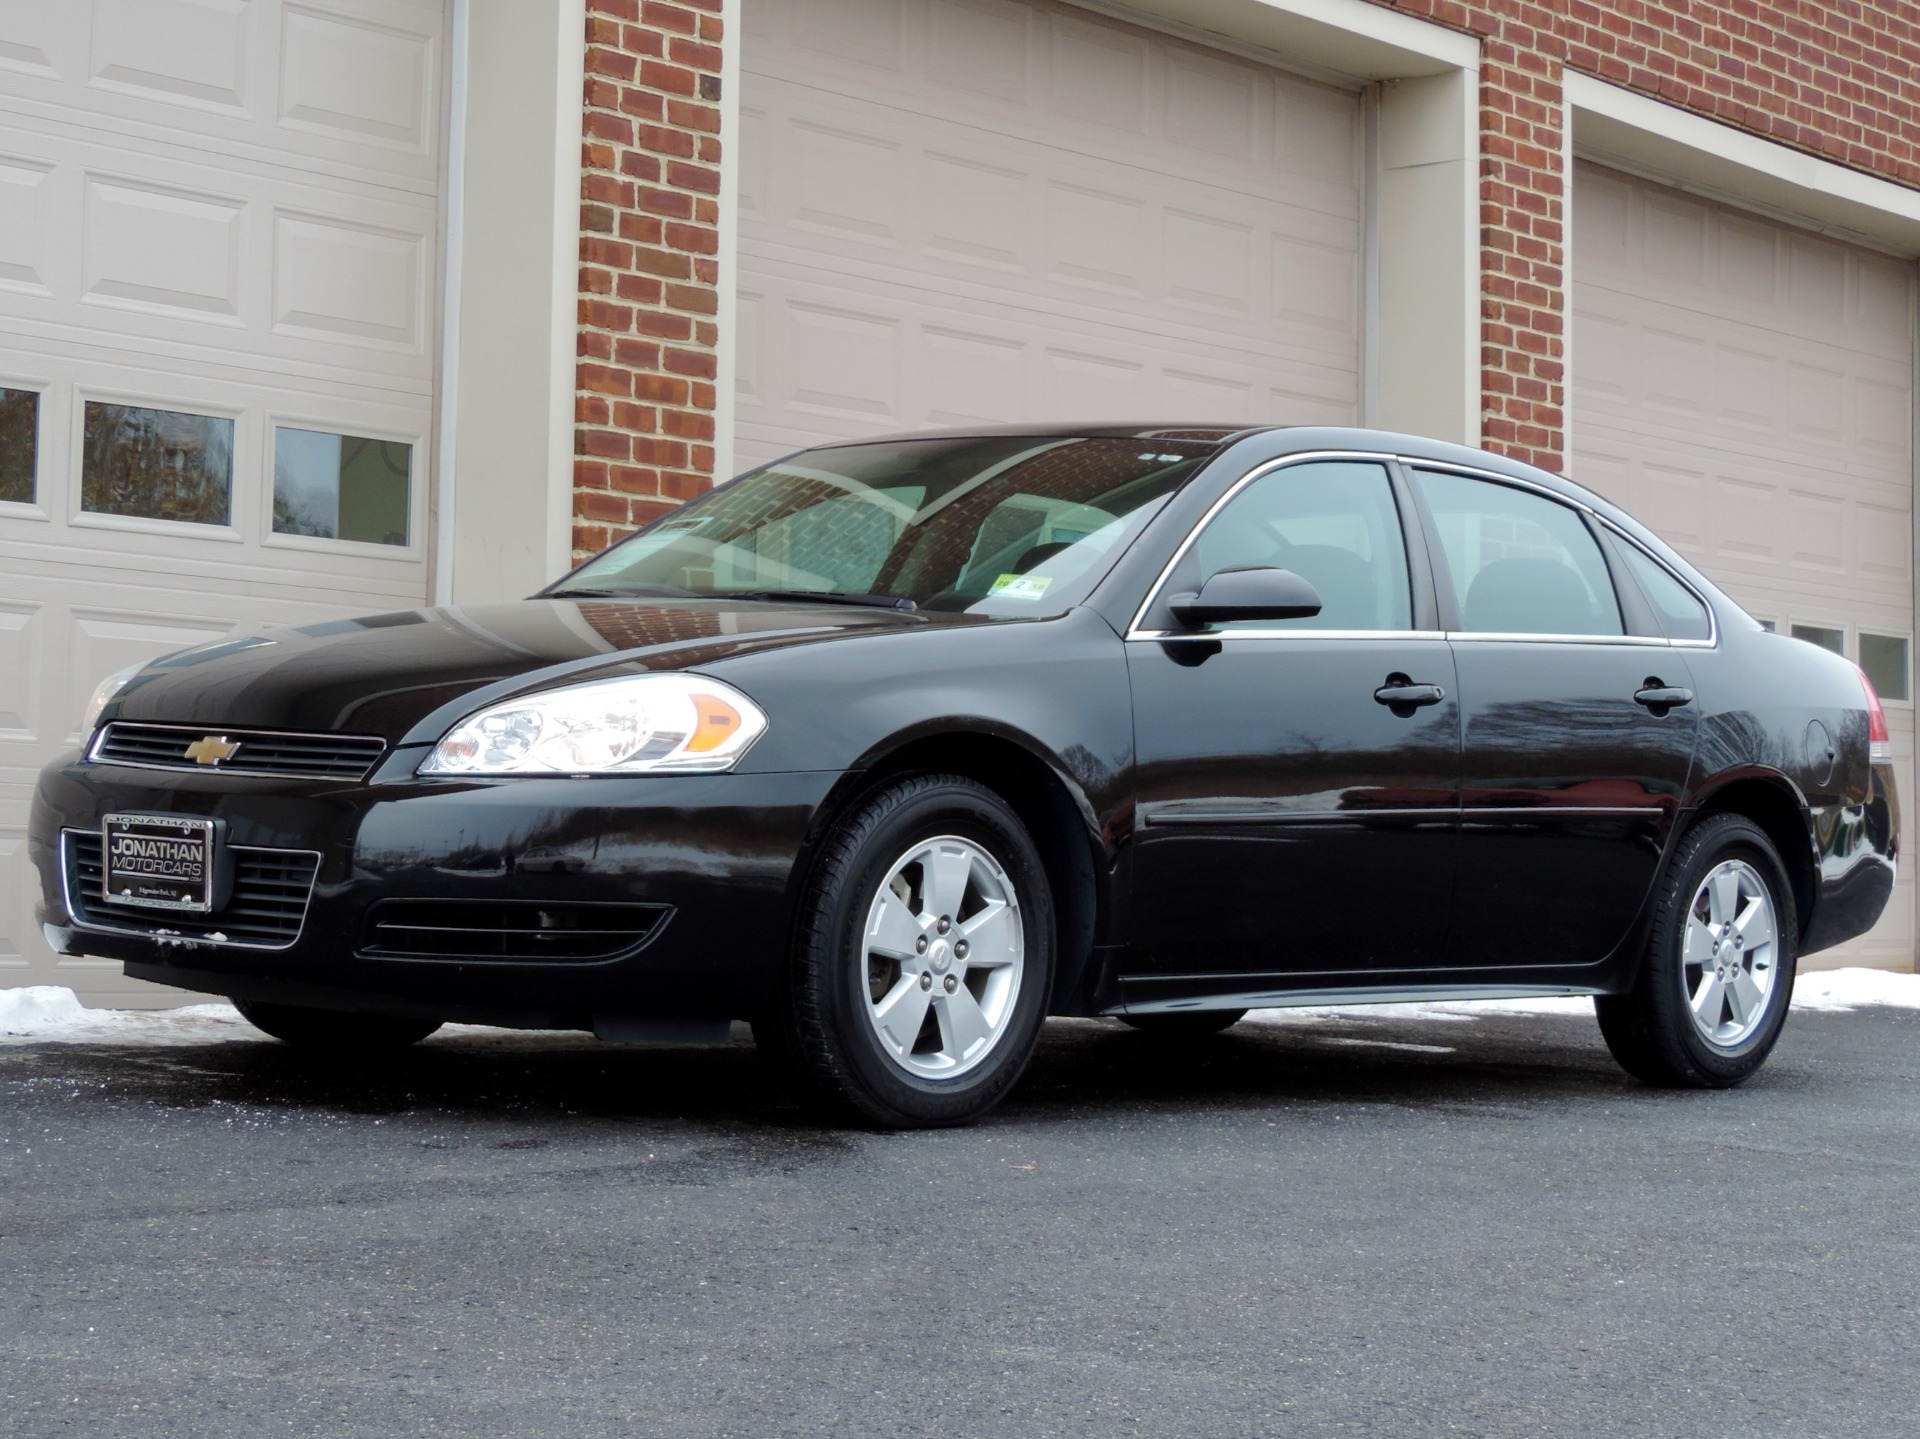 2011 Chevrolet Impala Ls Fleet Stock 314925 For Sale